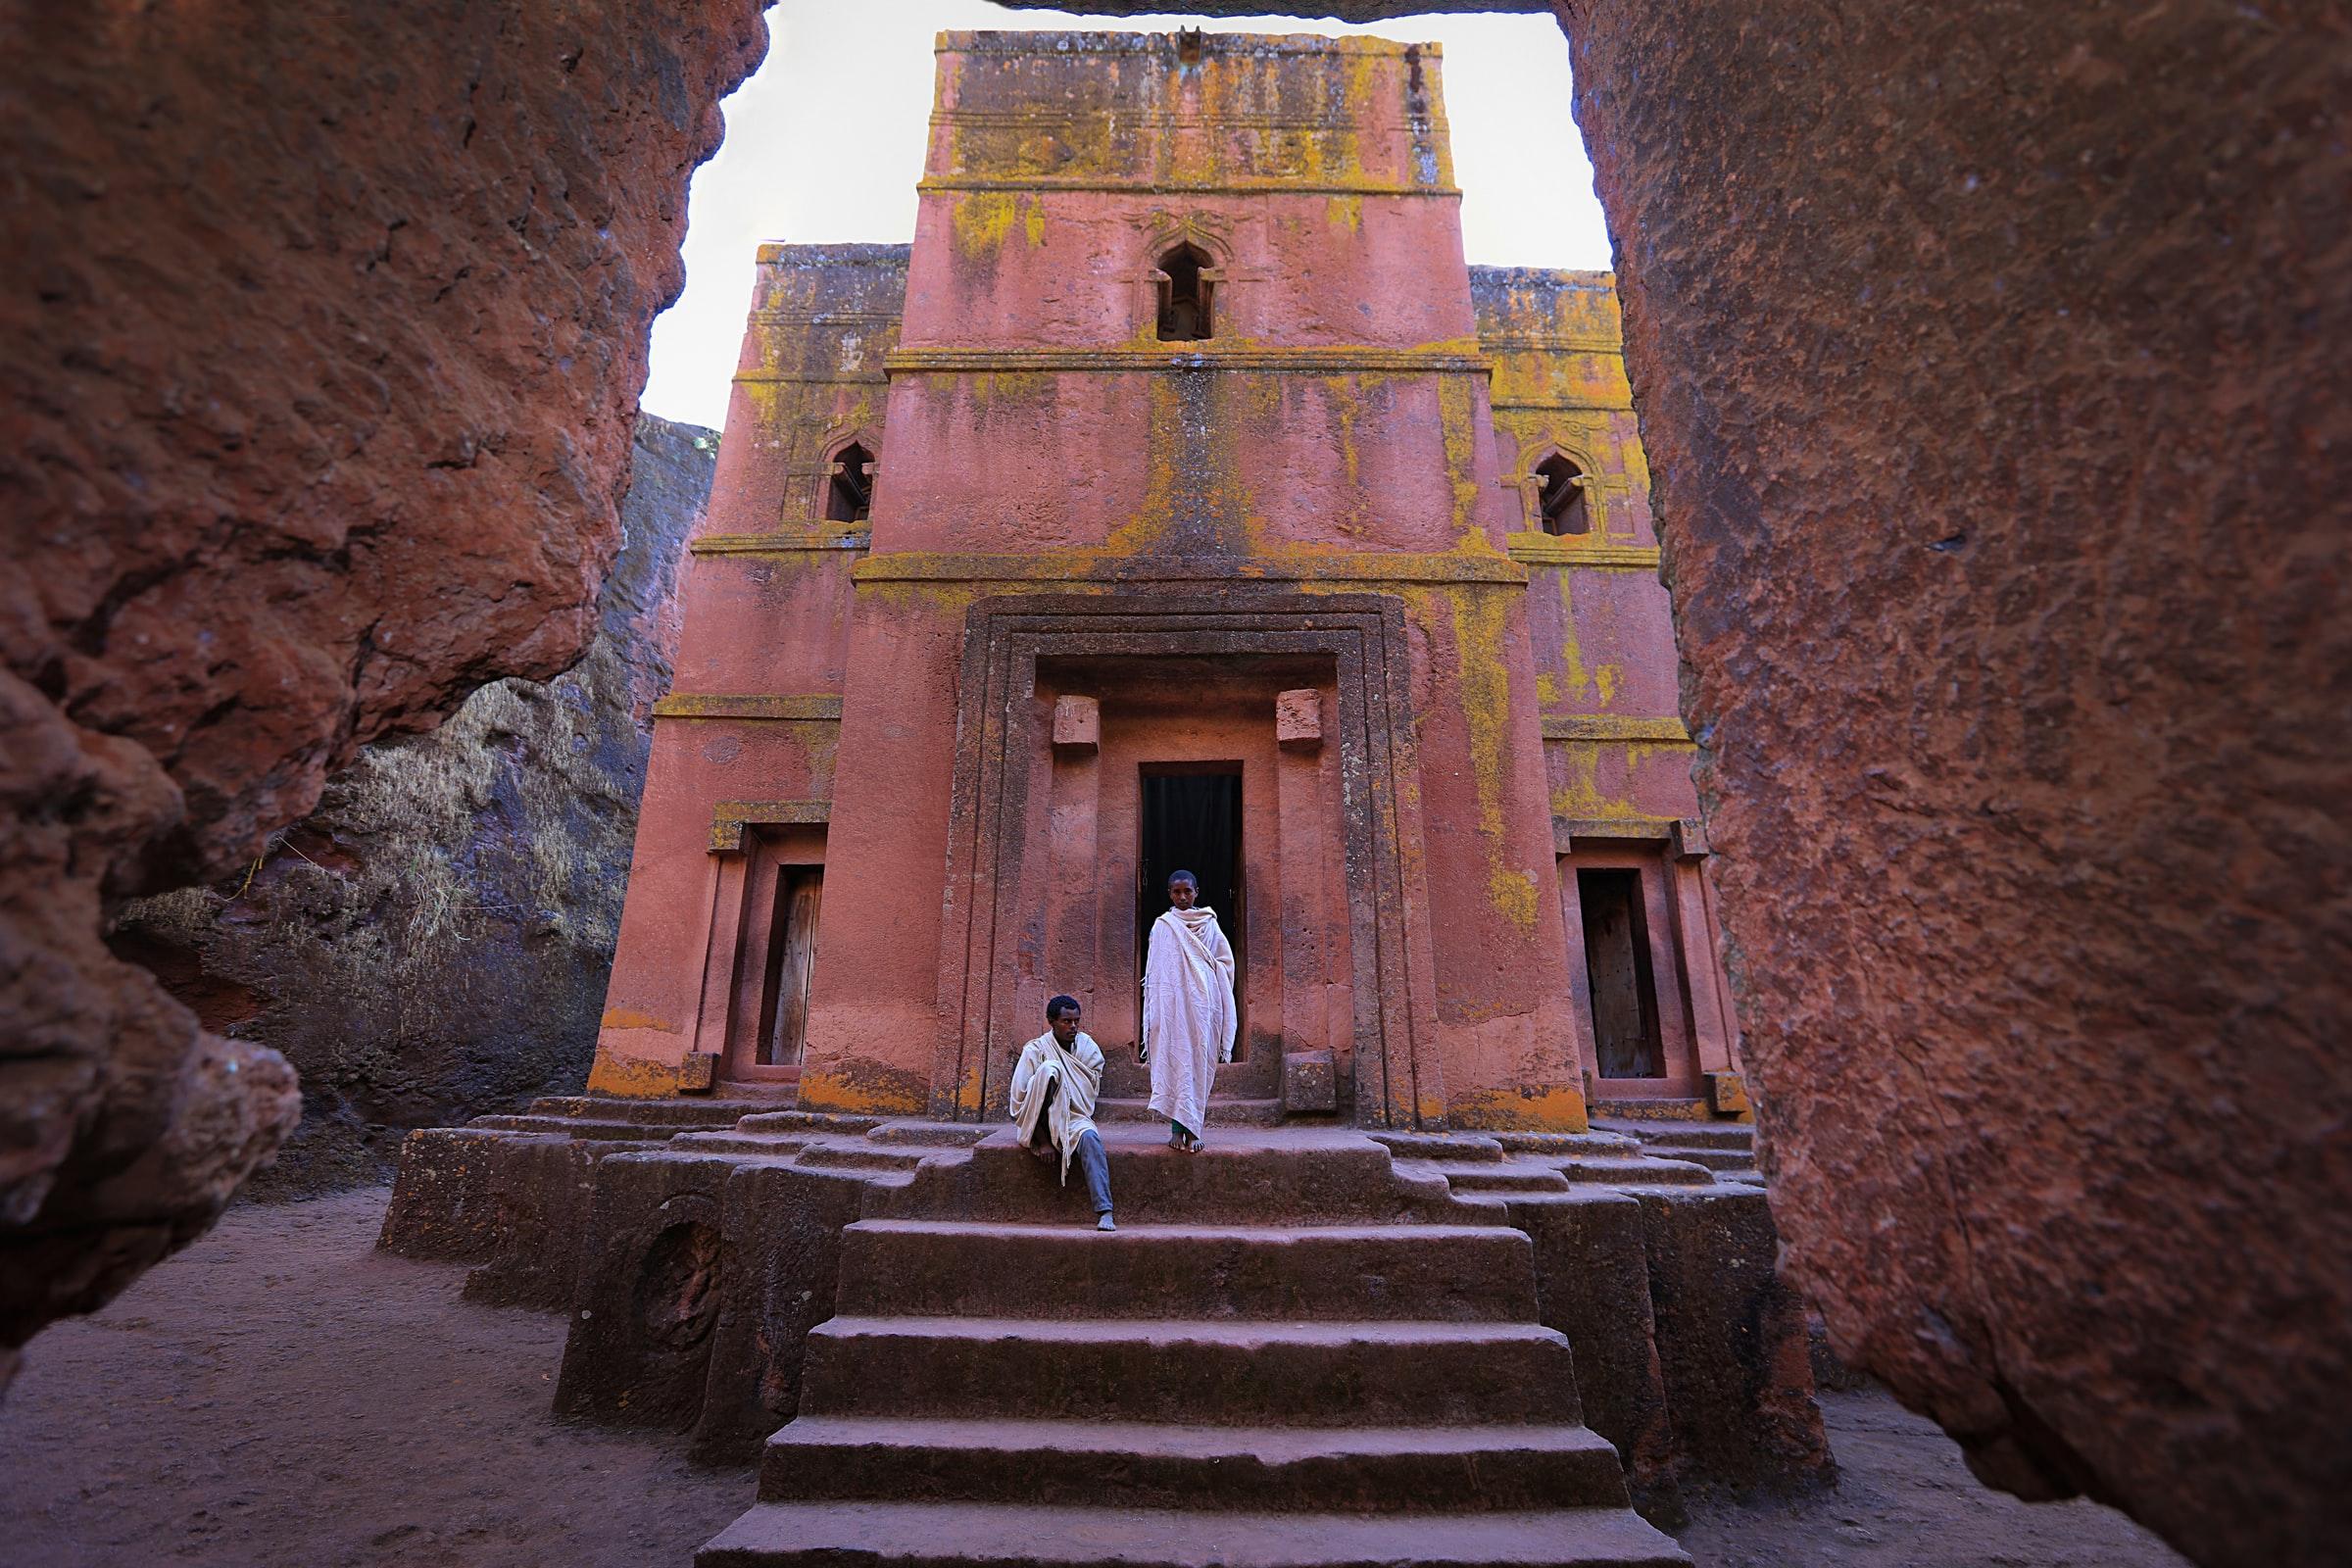 Must sees in Lalibela, Ethiopië, Afrika: De Bet Giyorgis kerk